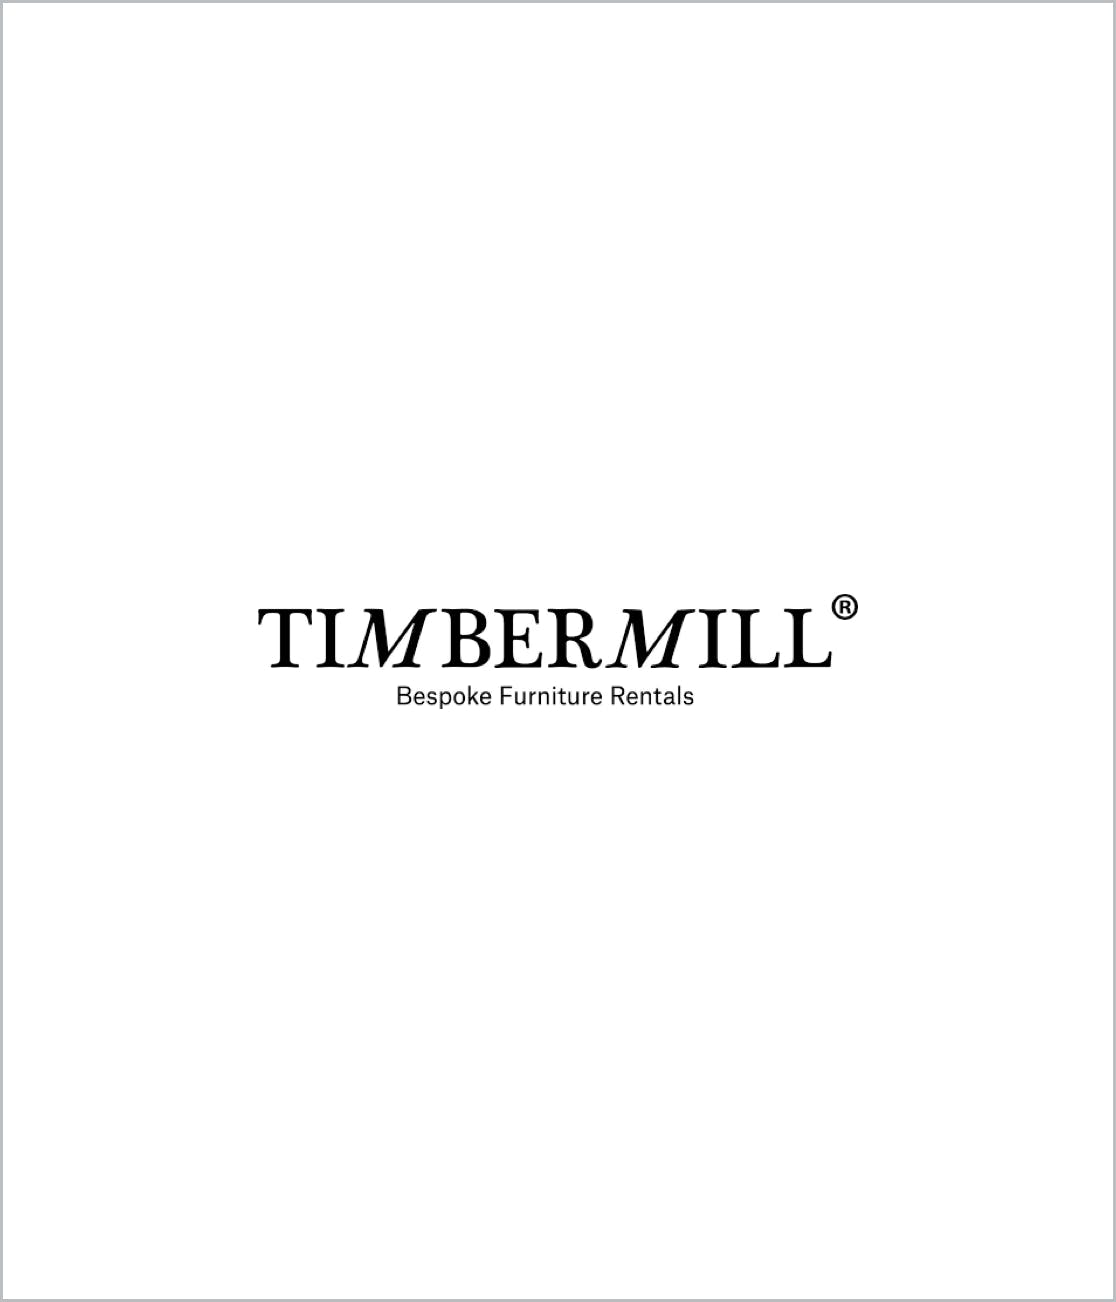 Timbermill Logo Supplier